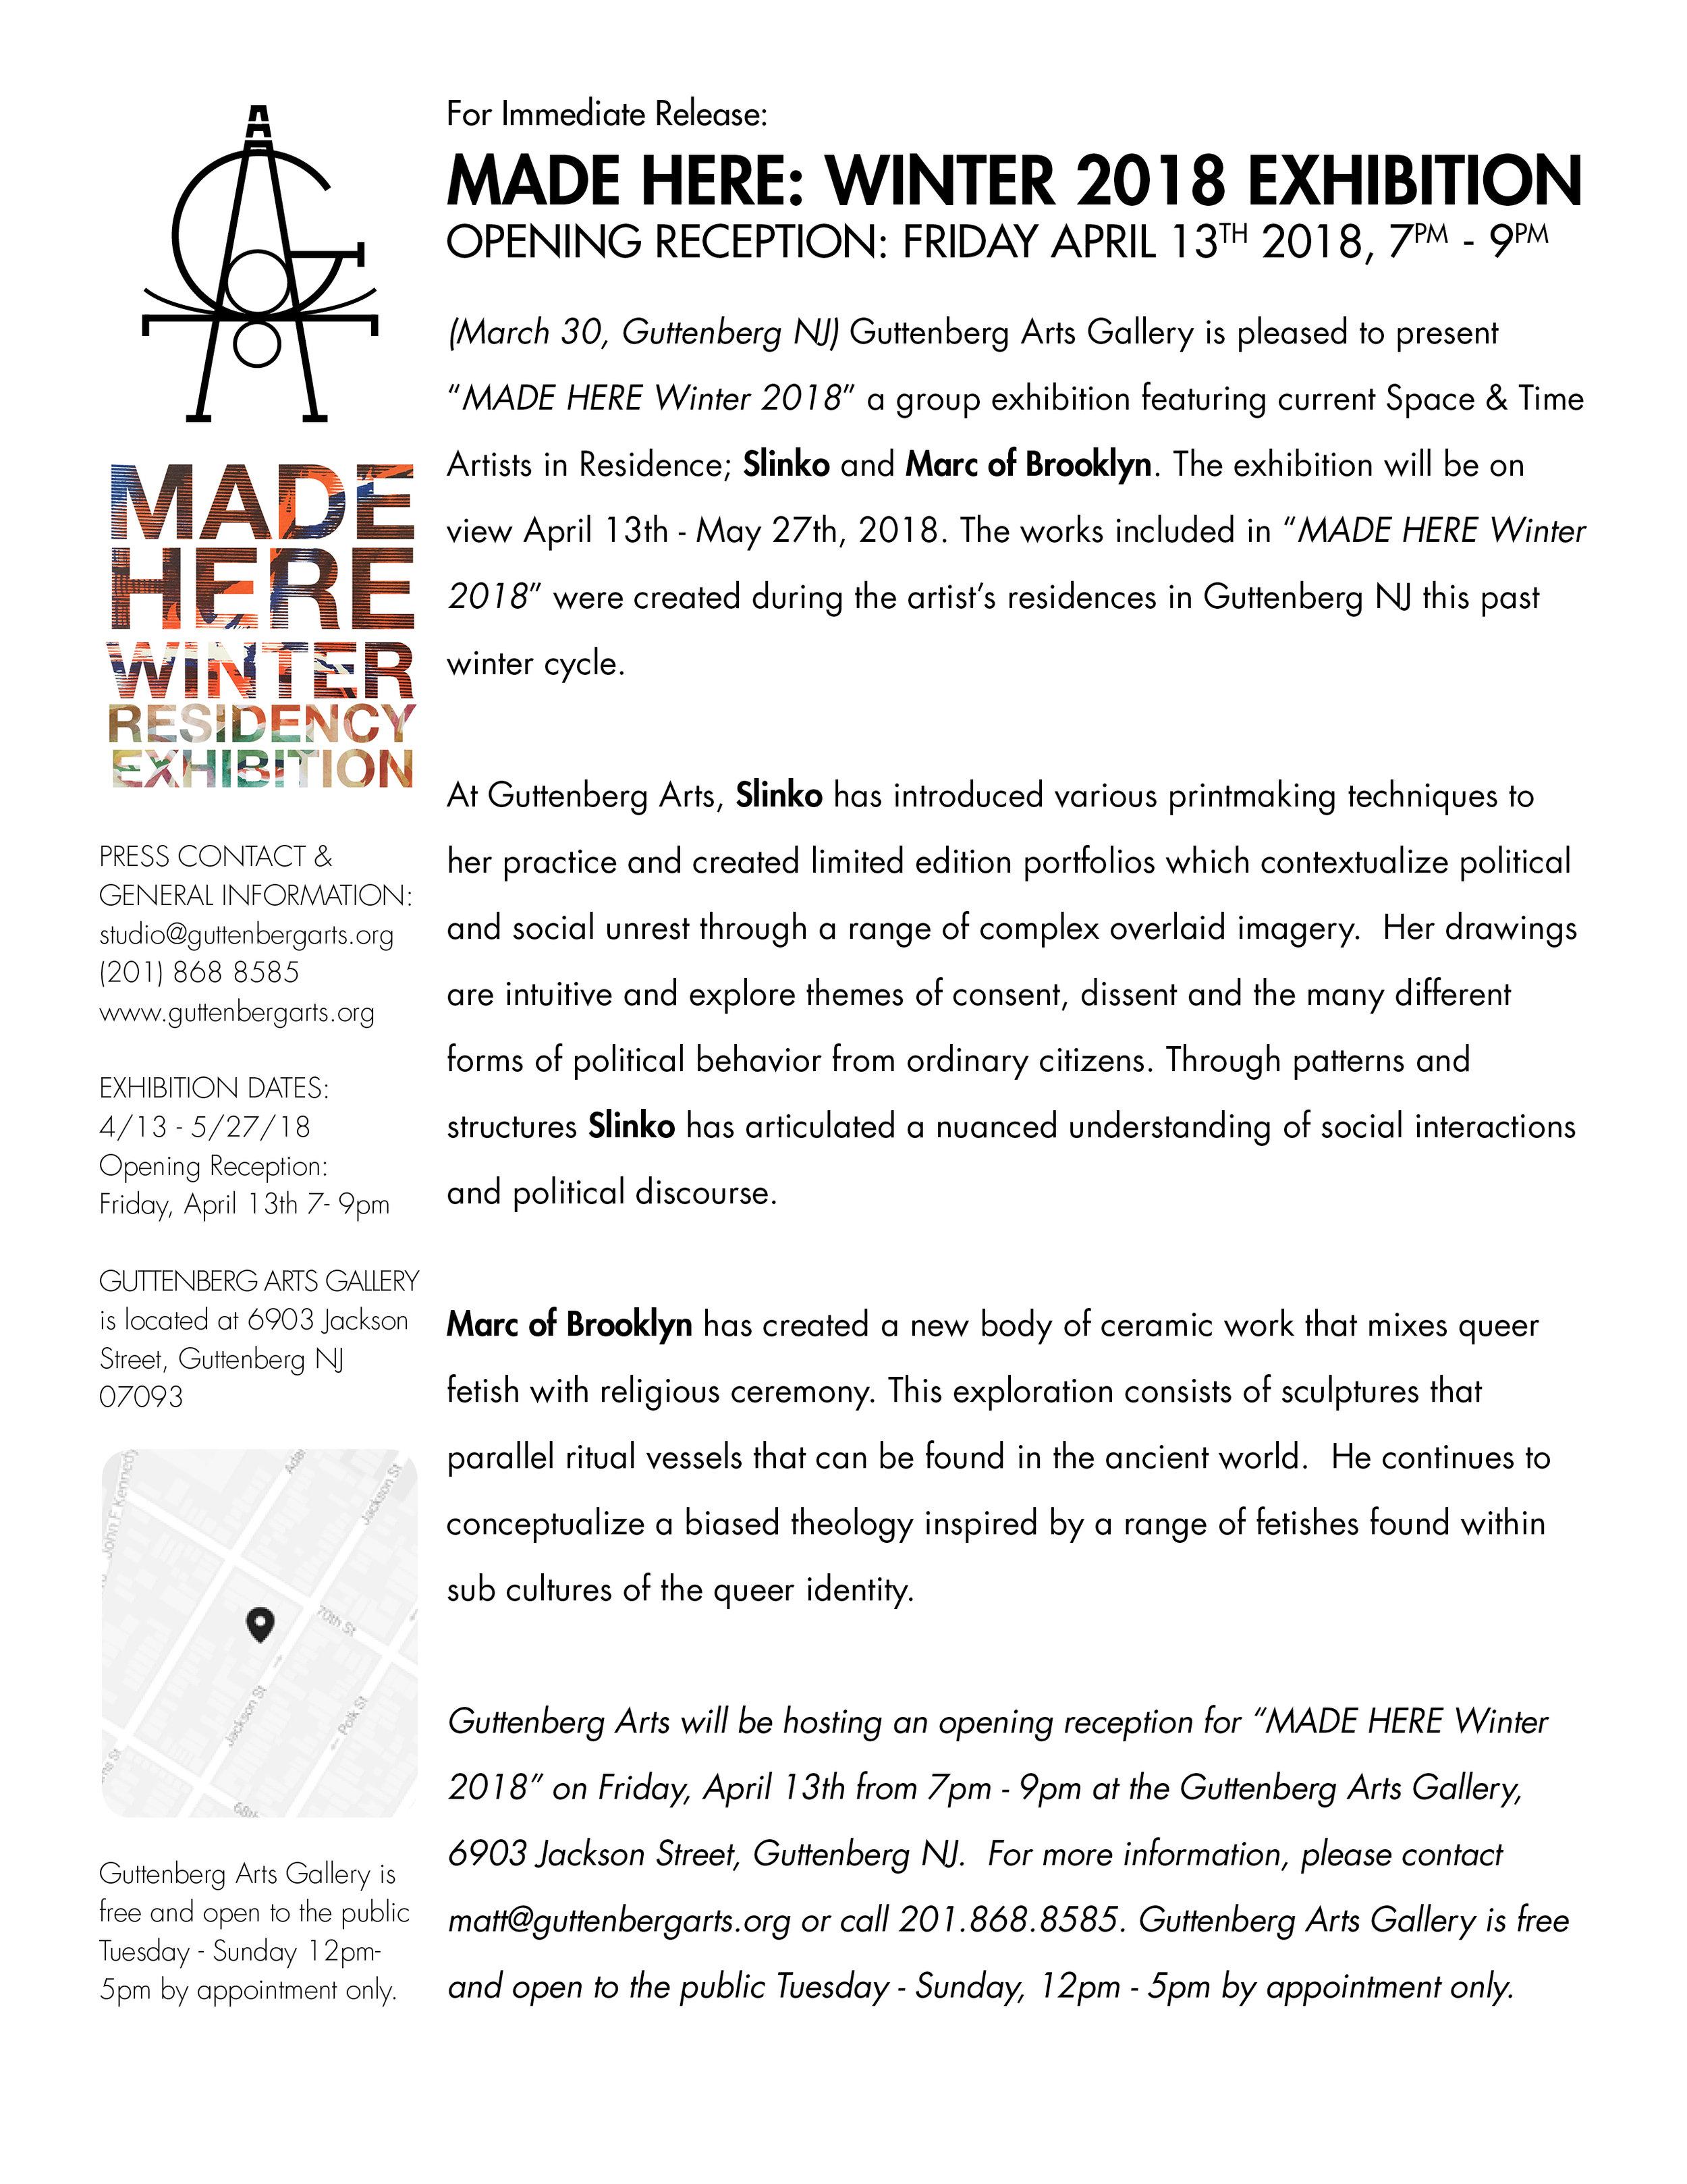 Made Here WInter 2018 Press Release.jpg